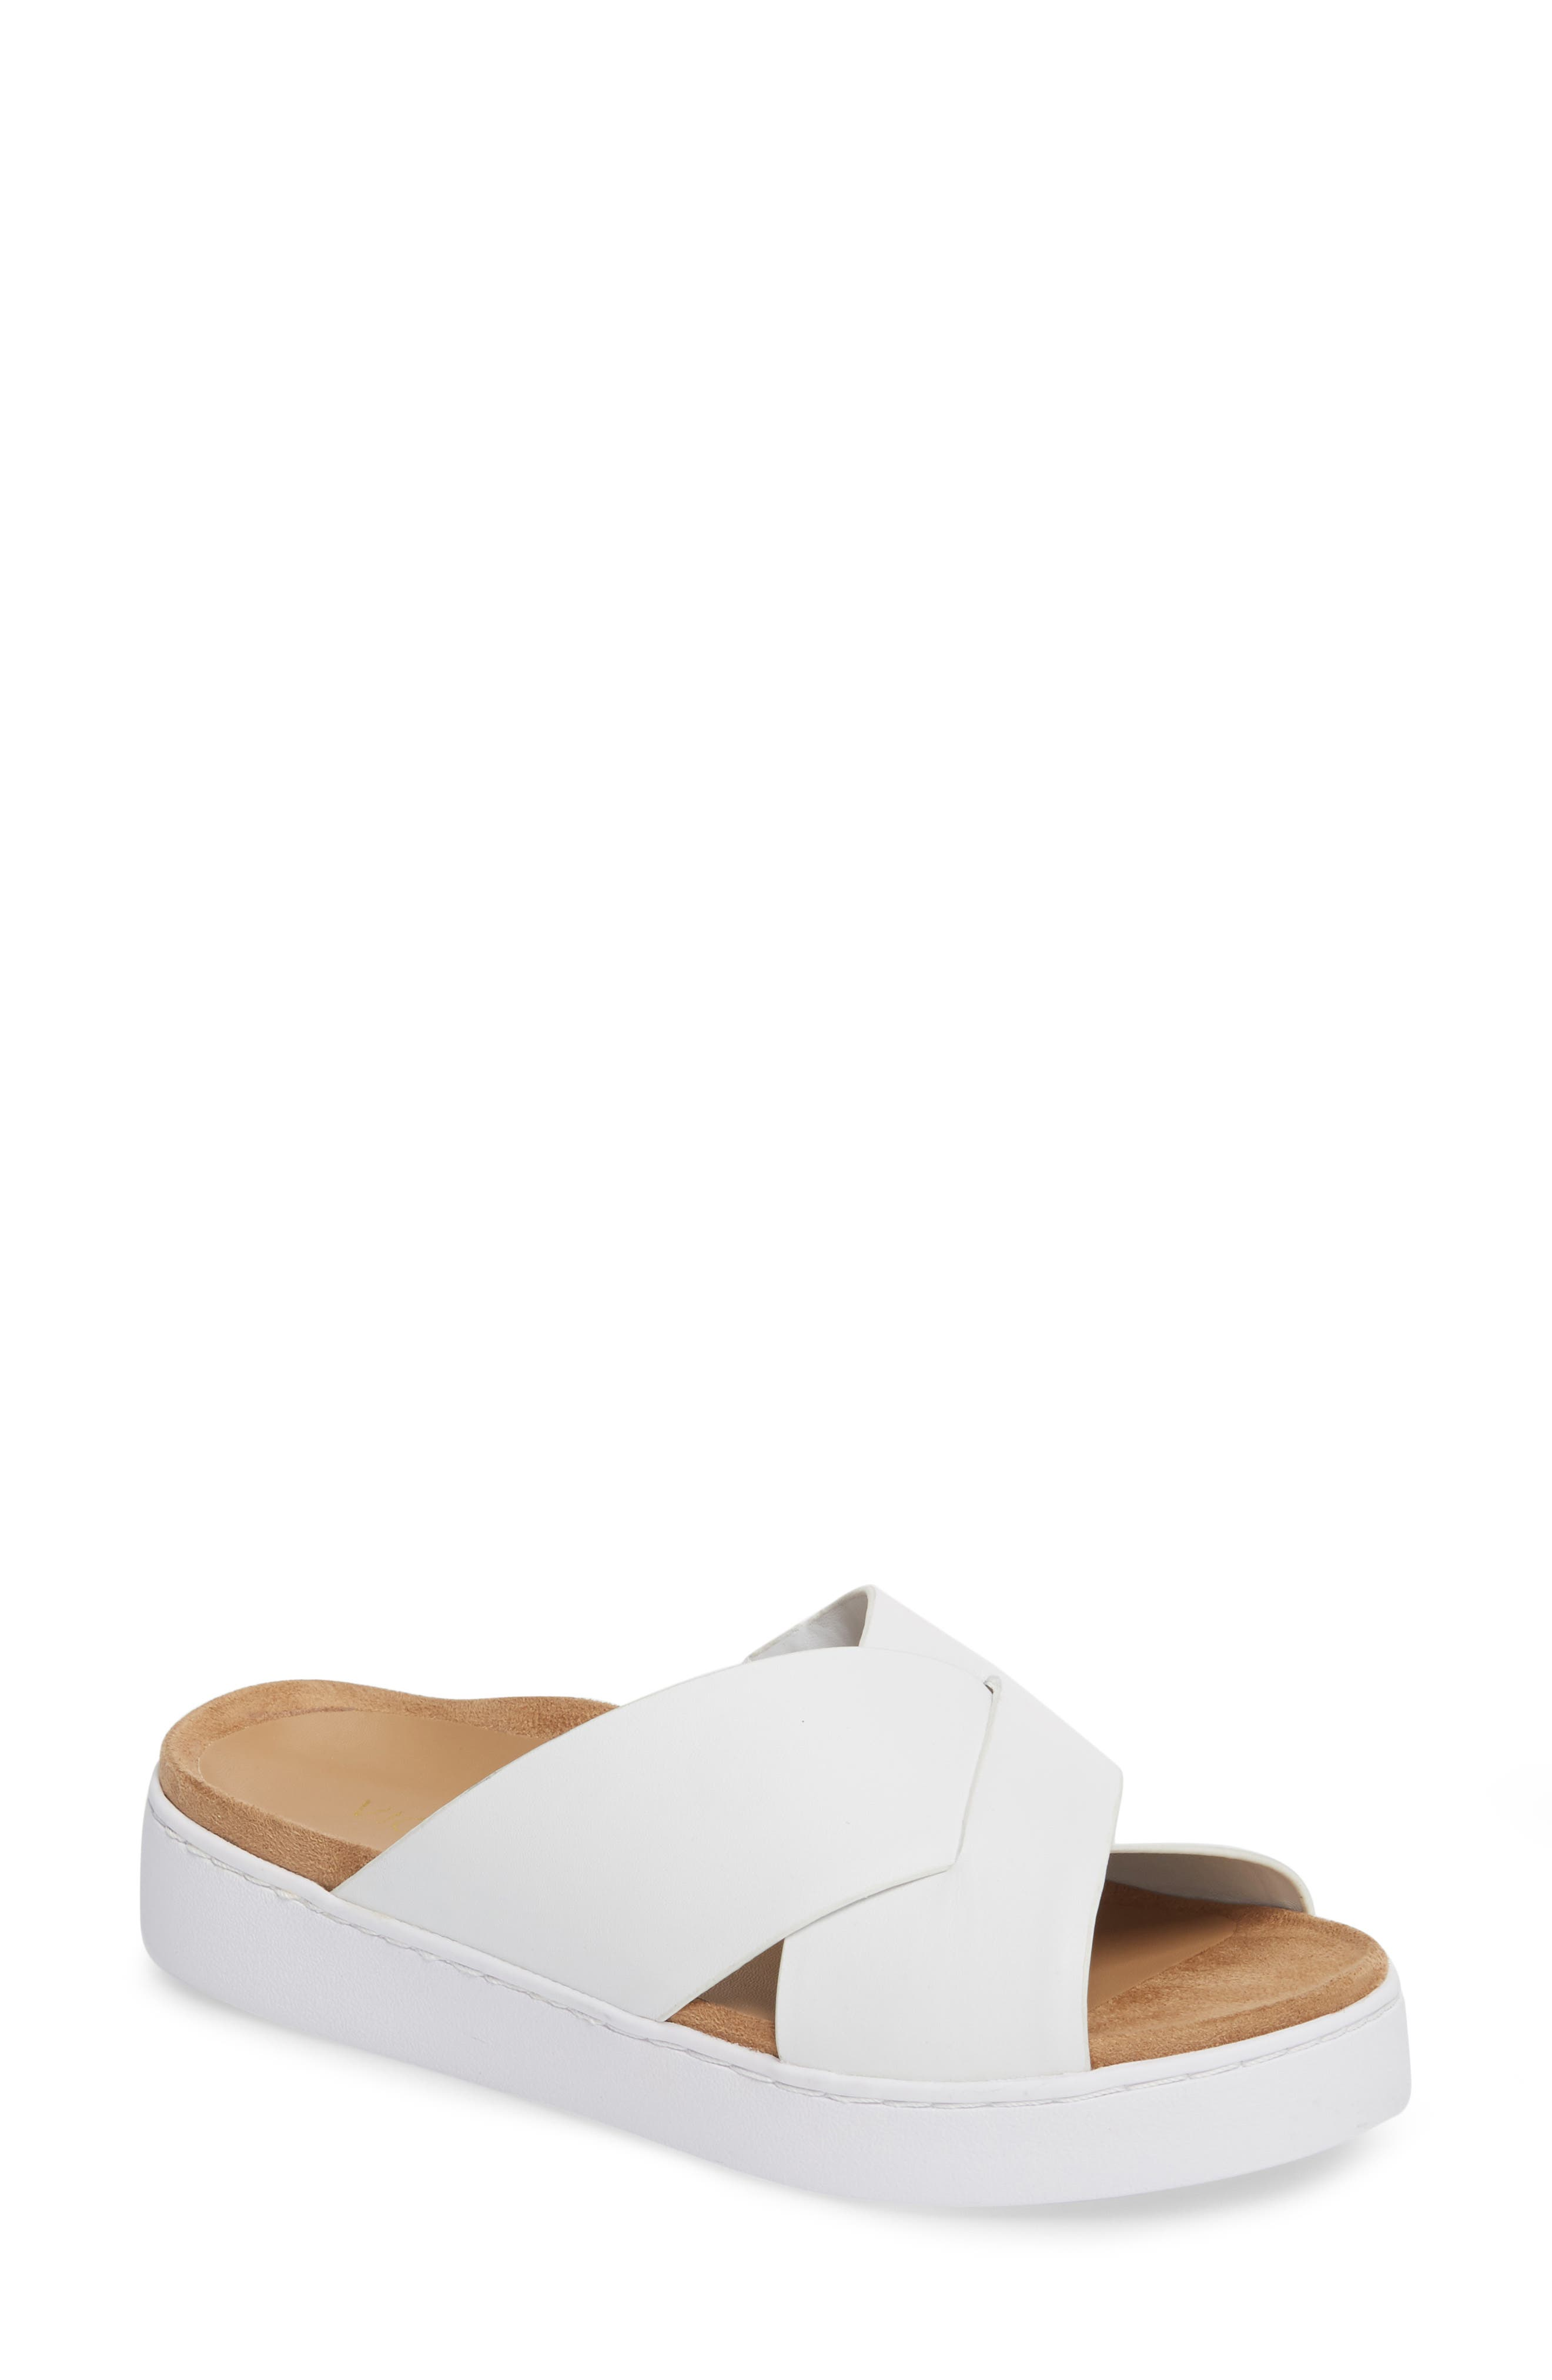 Lou Slide Sandal,                         Main,                         color, White Leather